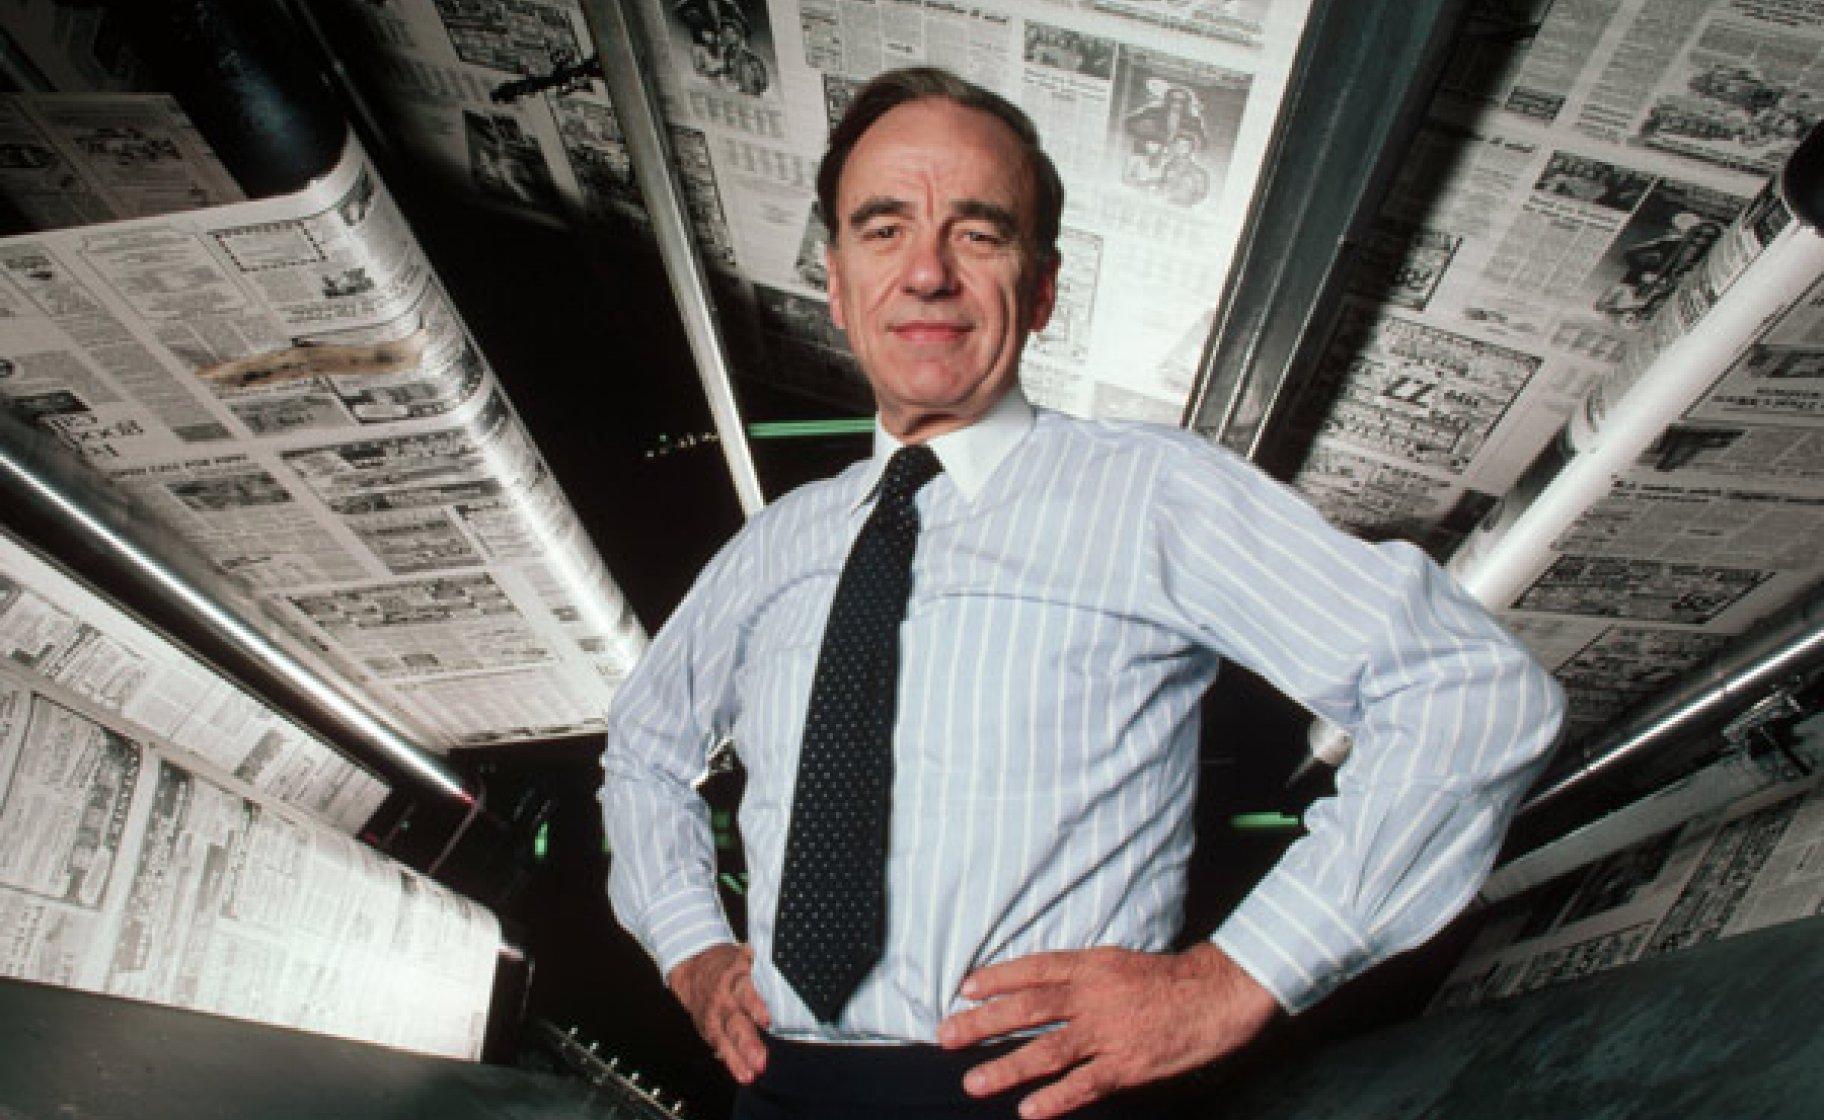 A frustrated politician: Rupert Murdoch in 1985. © Roger Ressmeyer/Corbis